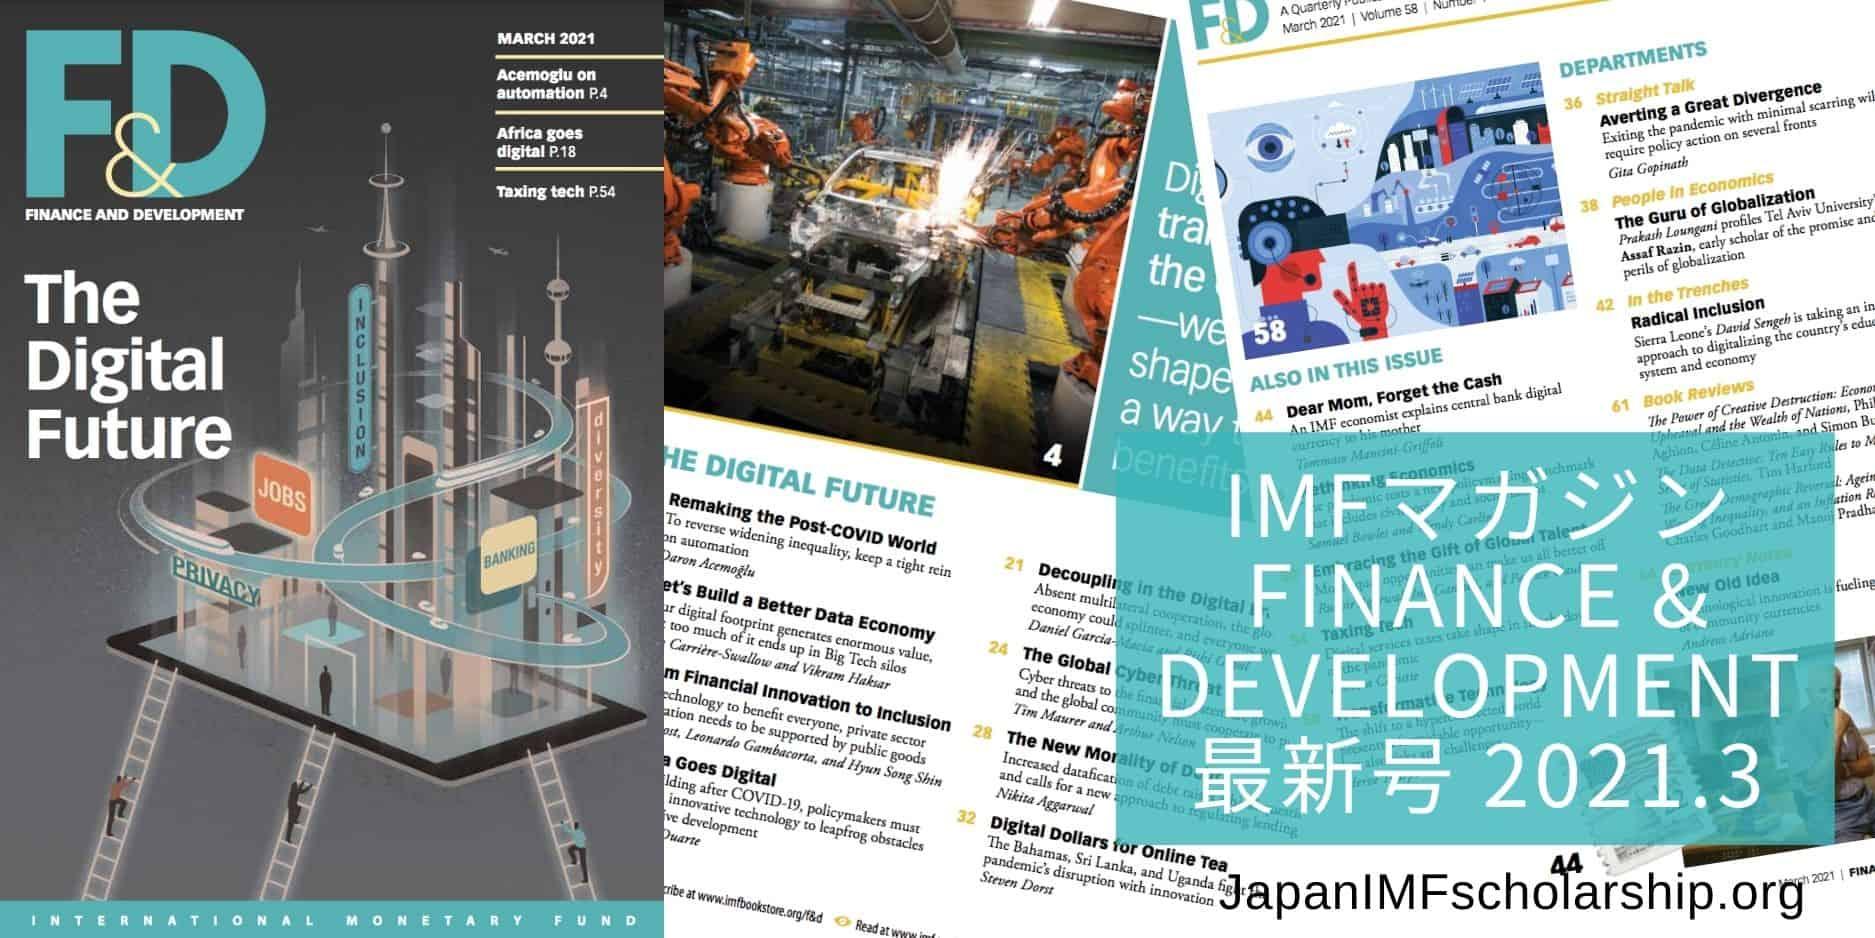 jisp web-fb imf magazine finance and development the digital future march 2021